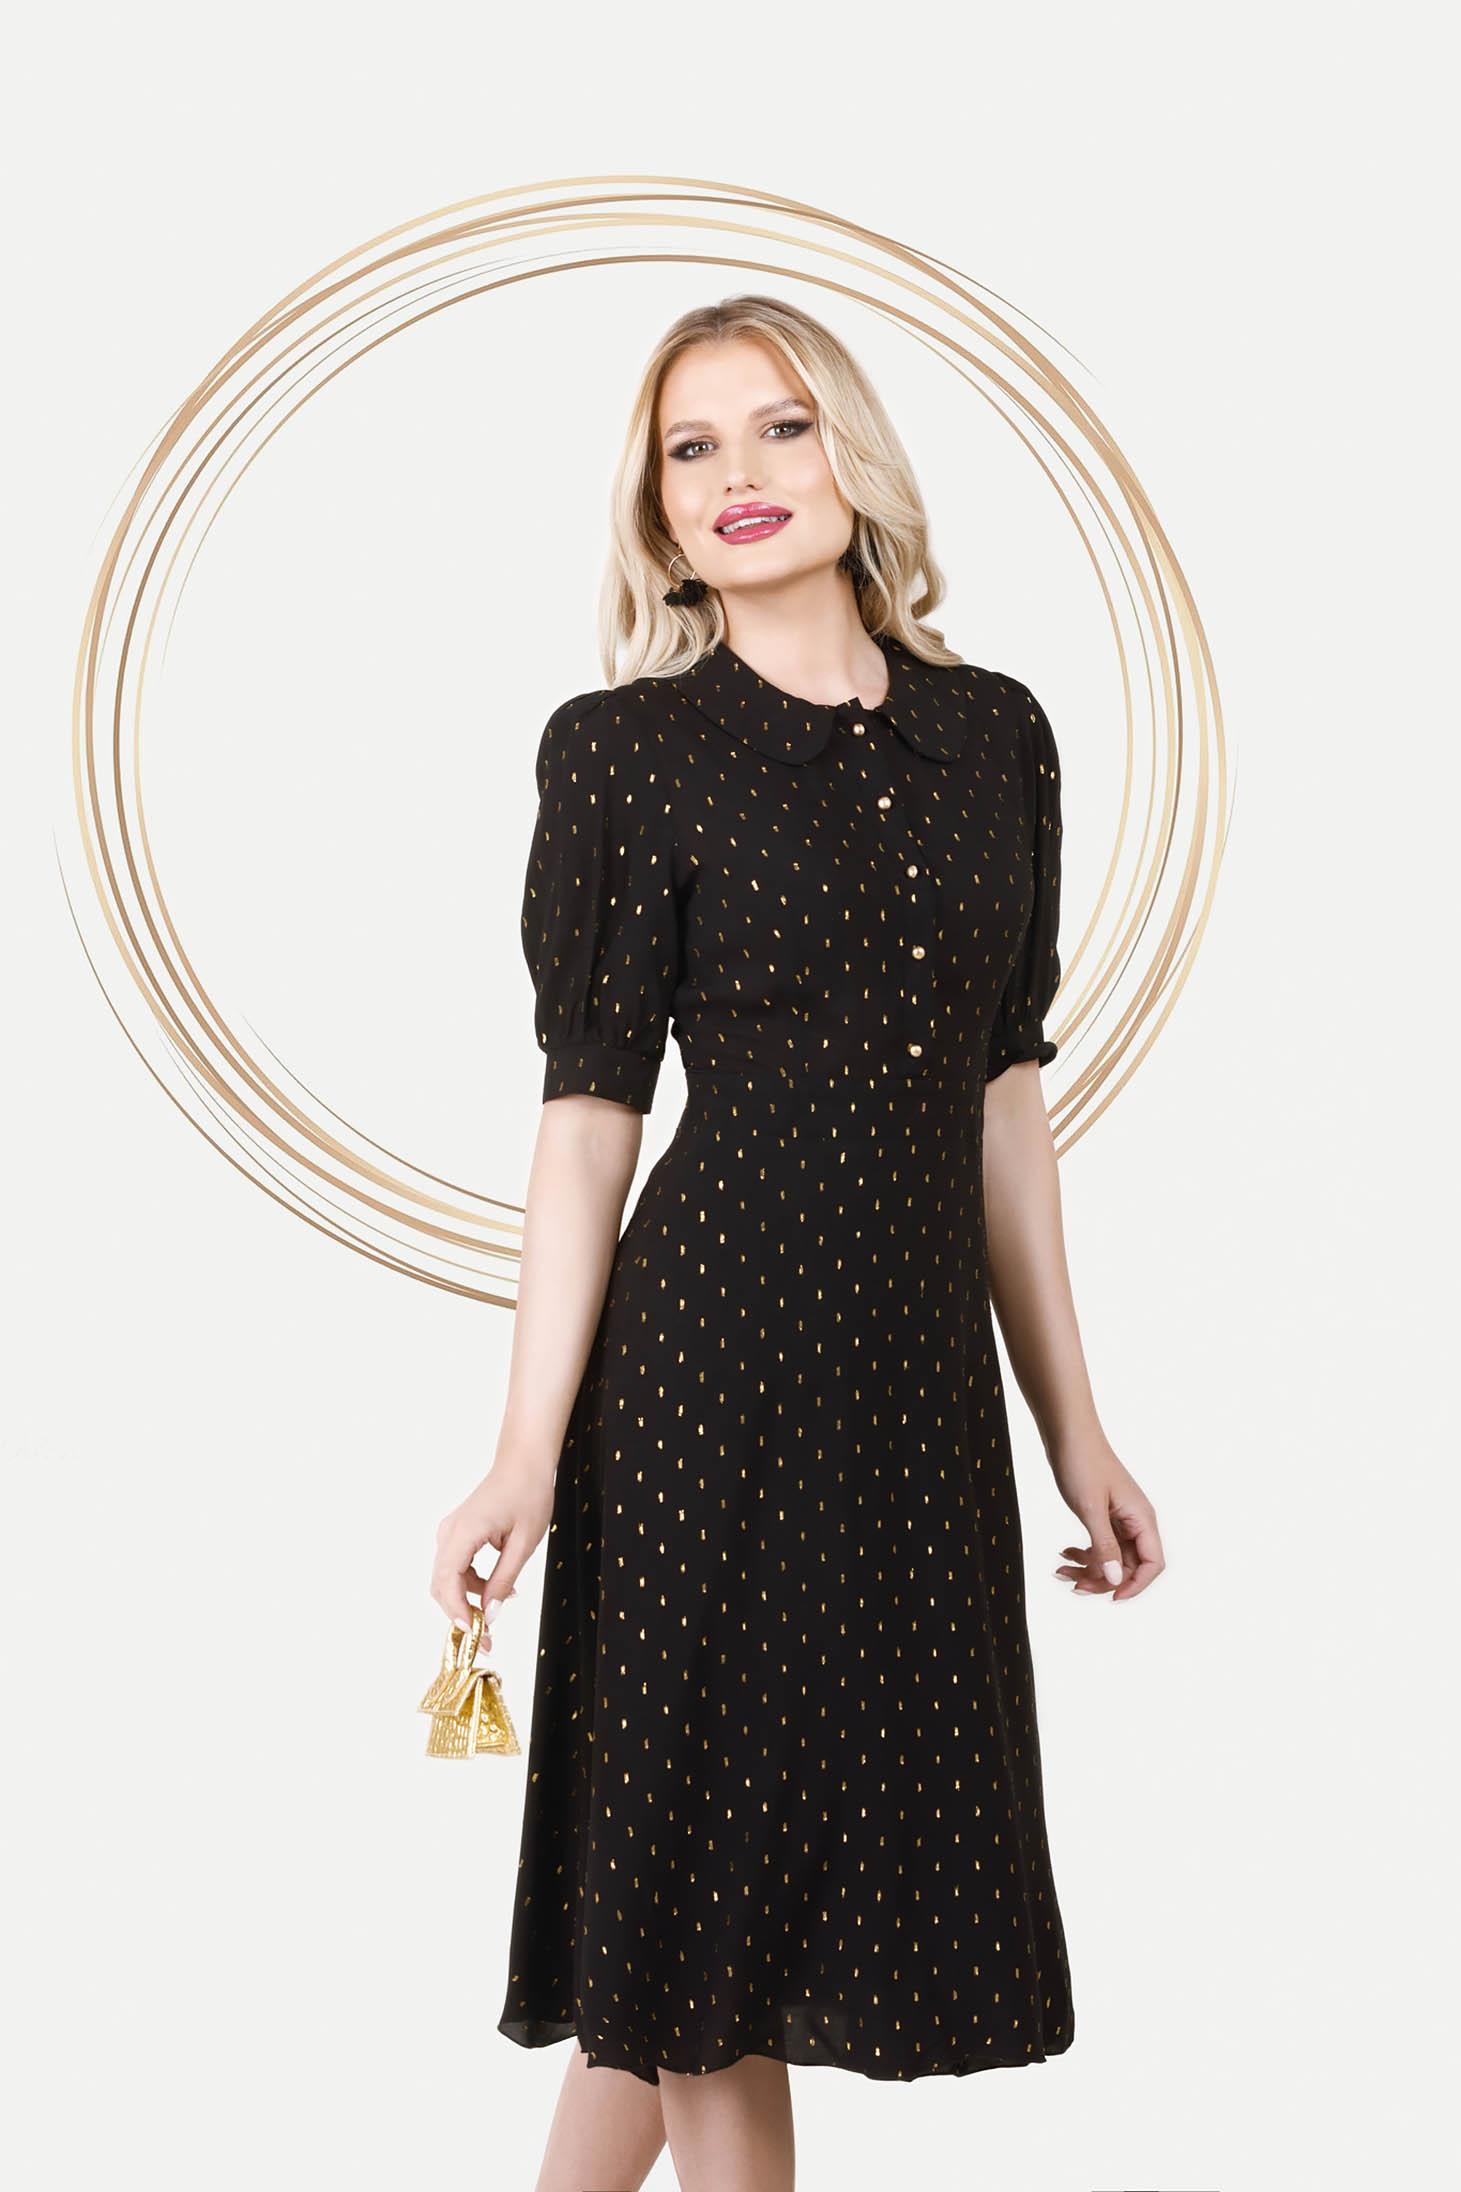 Fekete bő ujjú elegáns midi harang ruha vékony anyagból